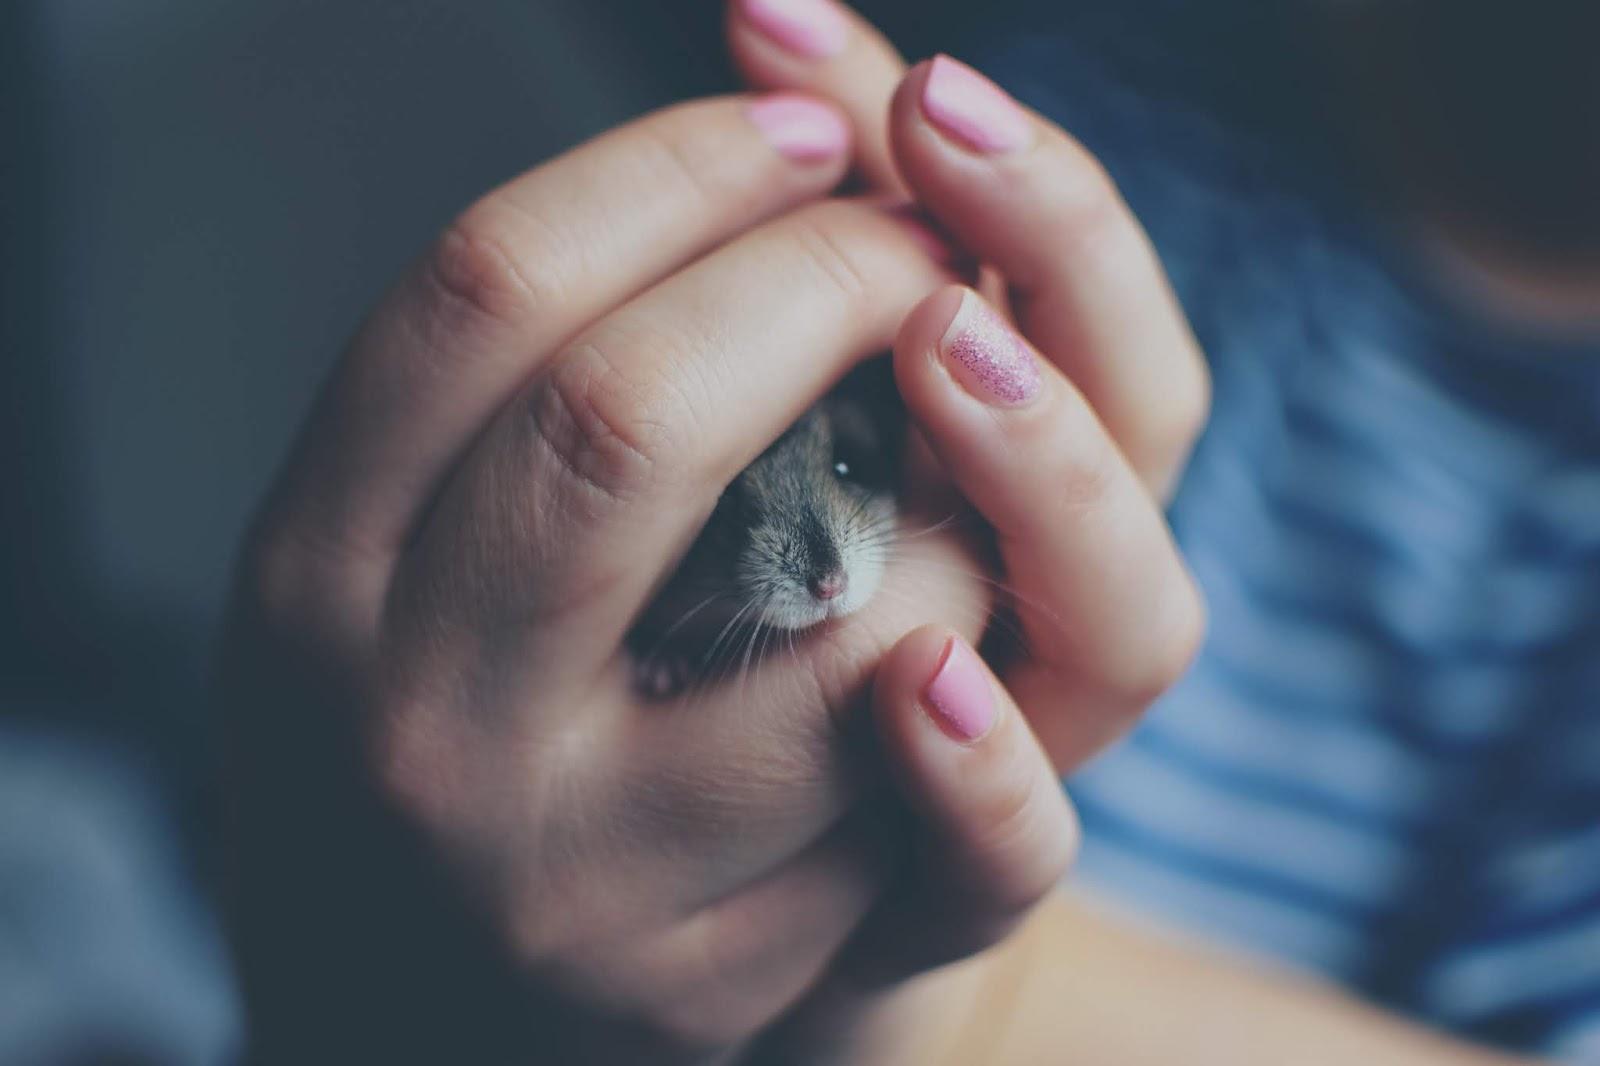 Mãos bonitas, bichinhos fofos, foto tumblr